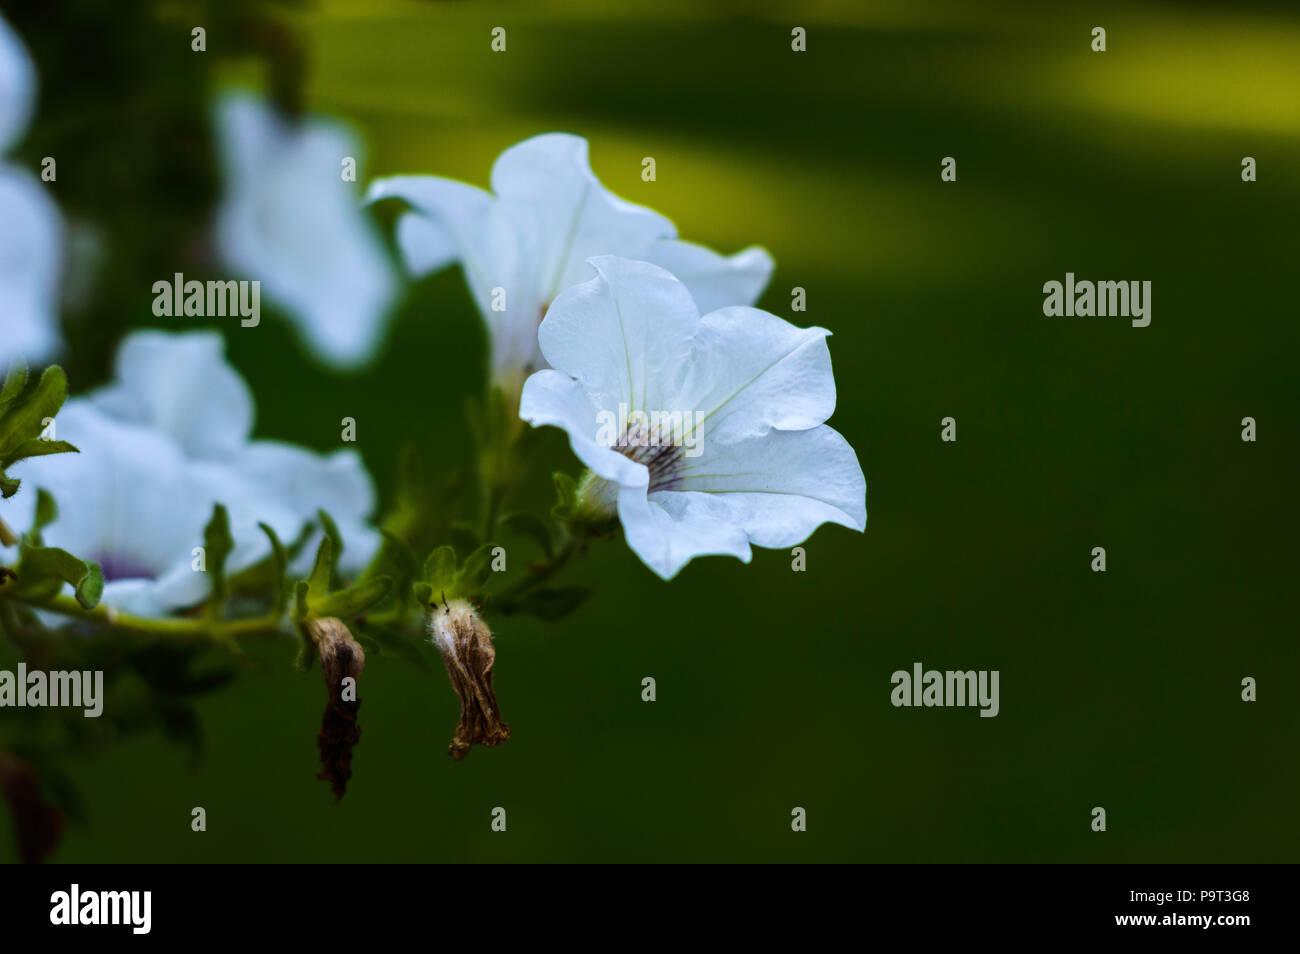 a beautiful morning glory flower - Stock Image